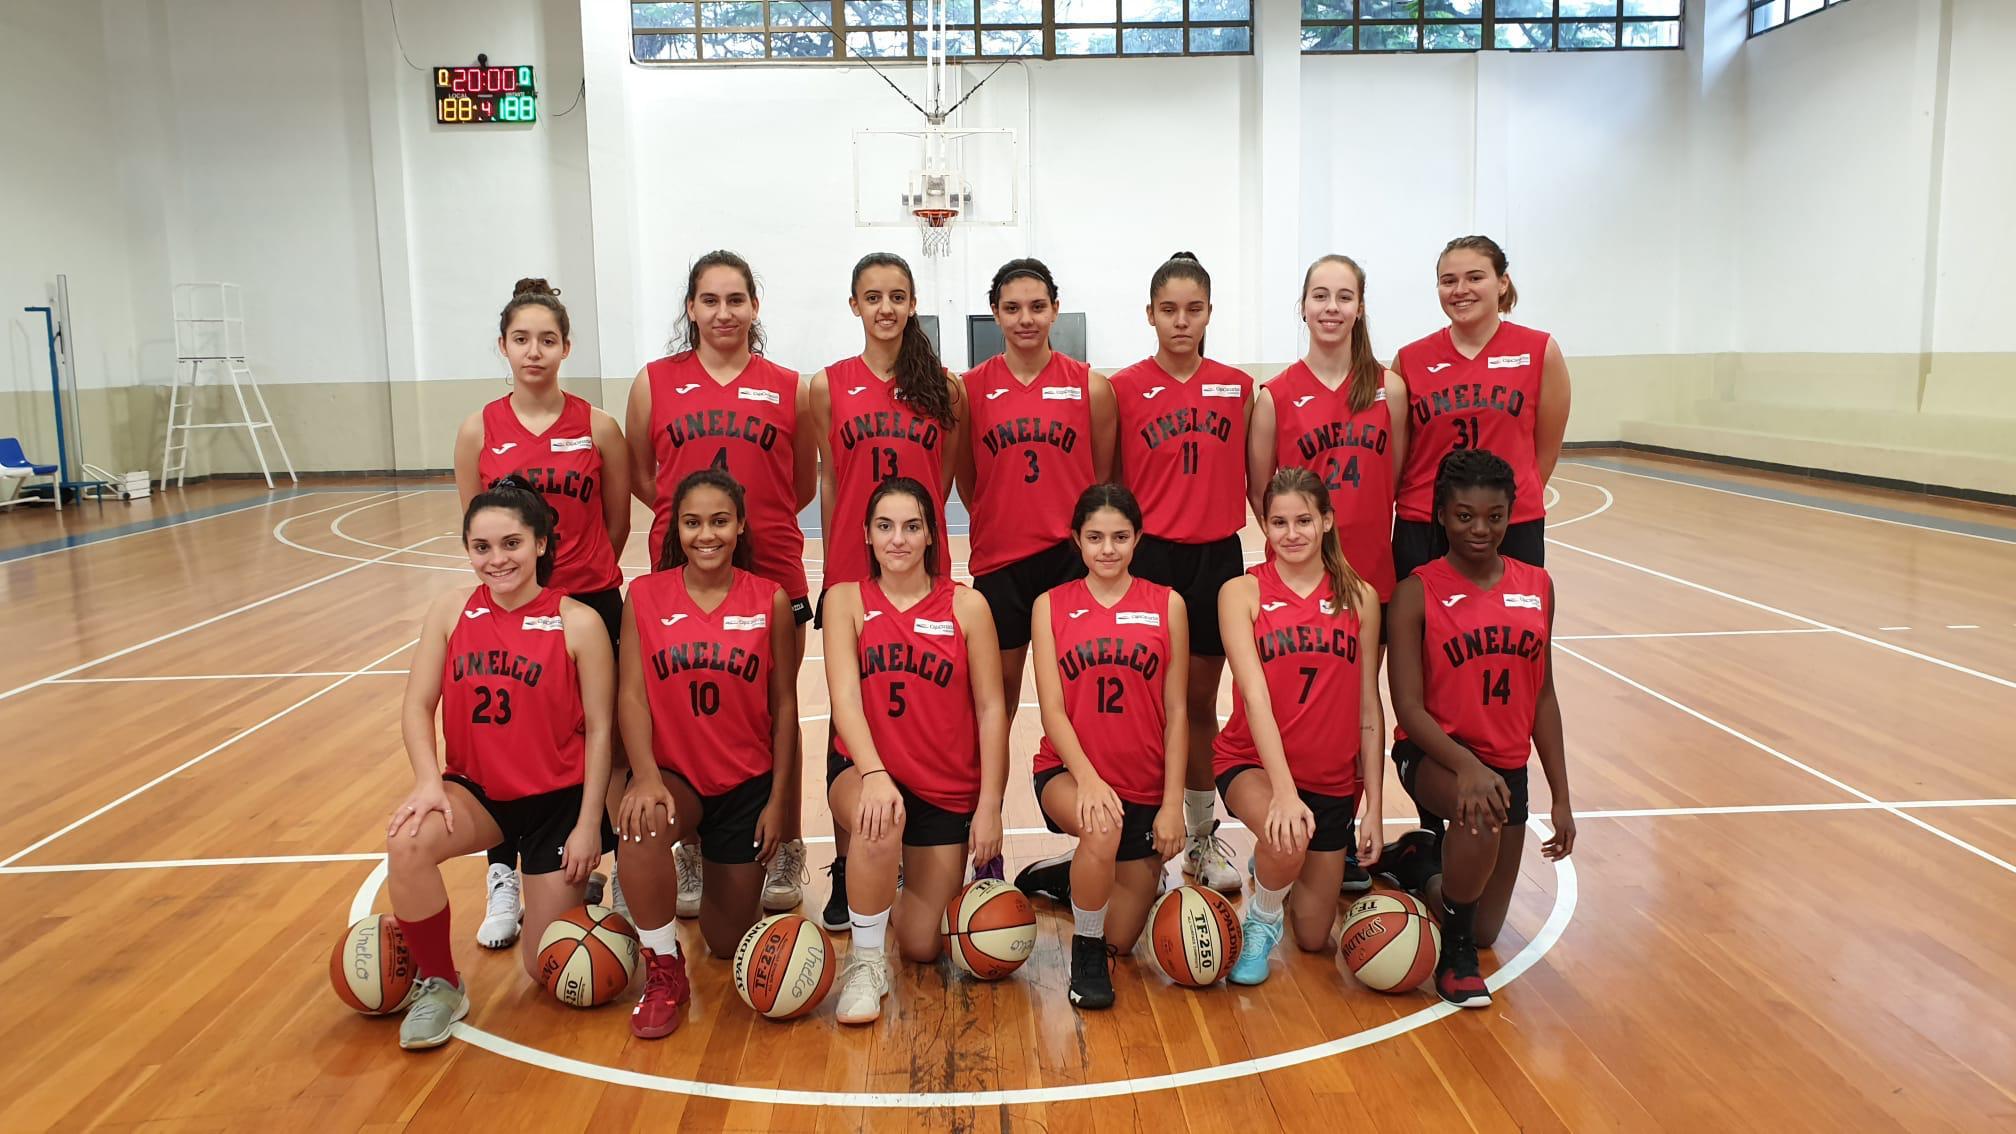 Doble presencia del Unelco en el 'XXIII Fred Olsen Express U18 International Basketball Tournament'